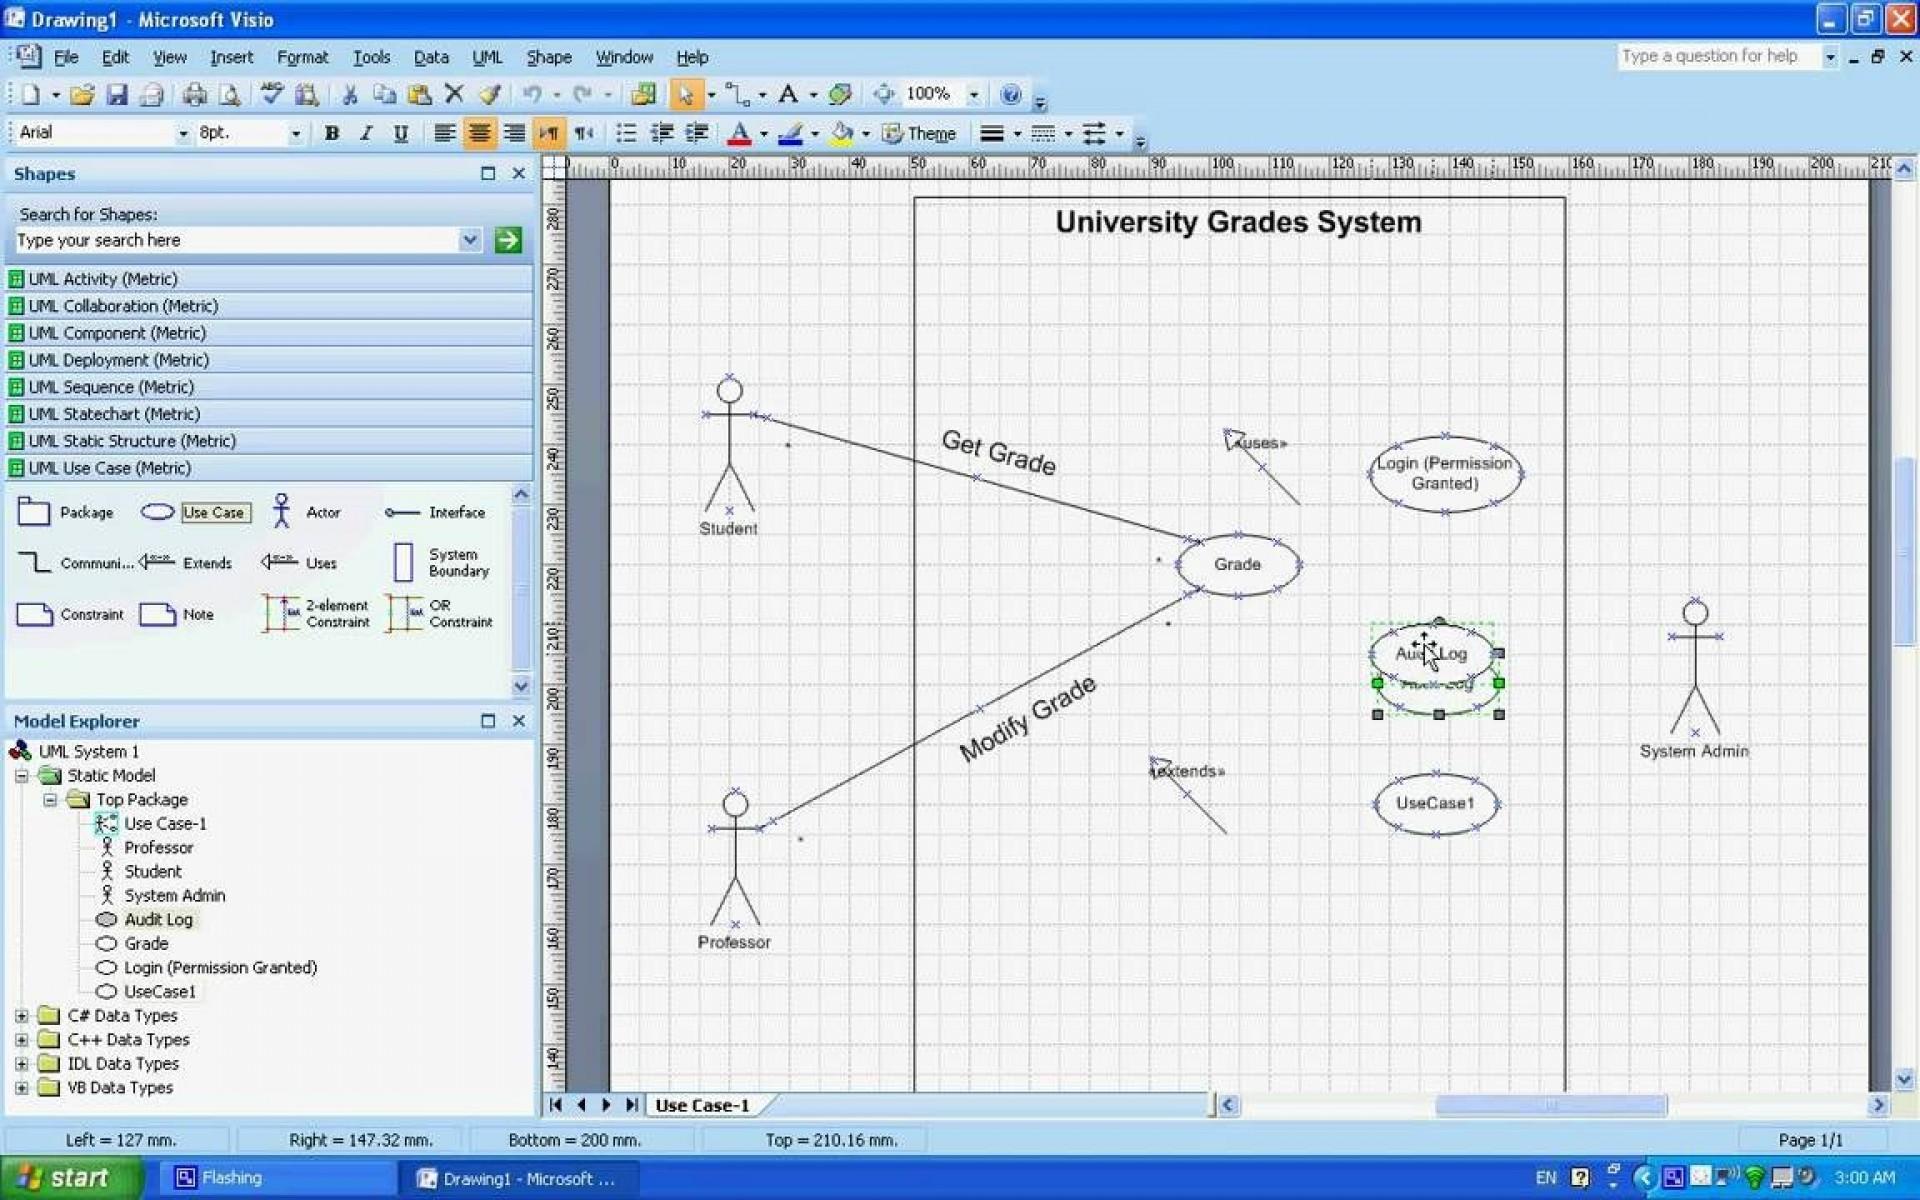 007 Impressive Use Case Diagram Microsoft Visio 2010 Example 1920